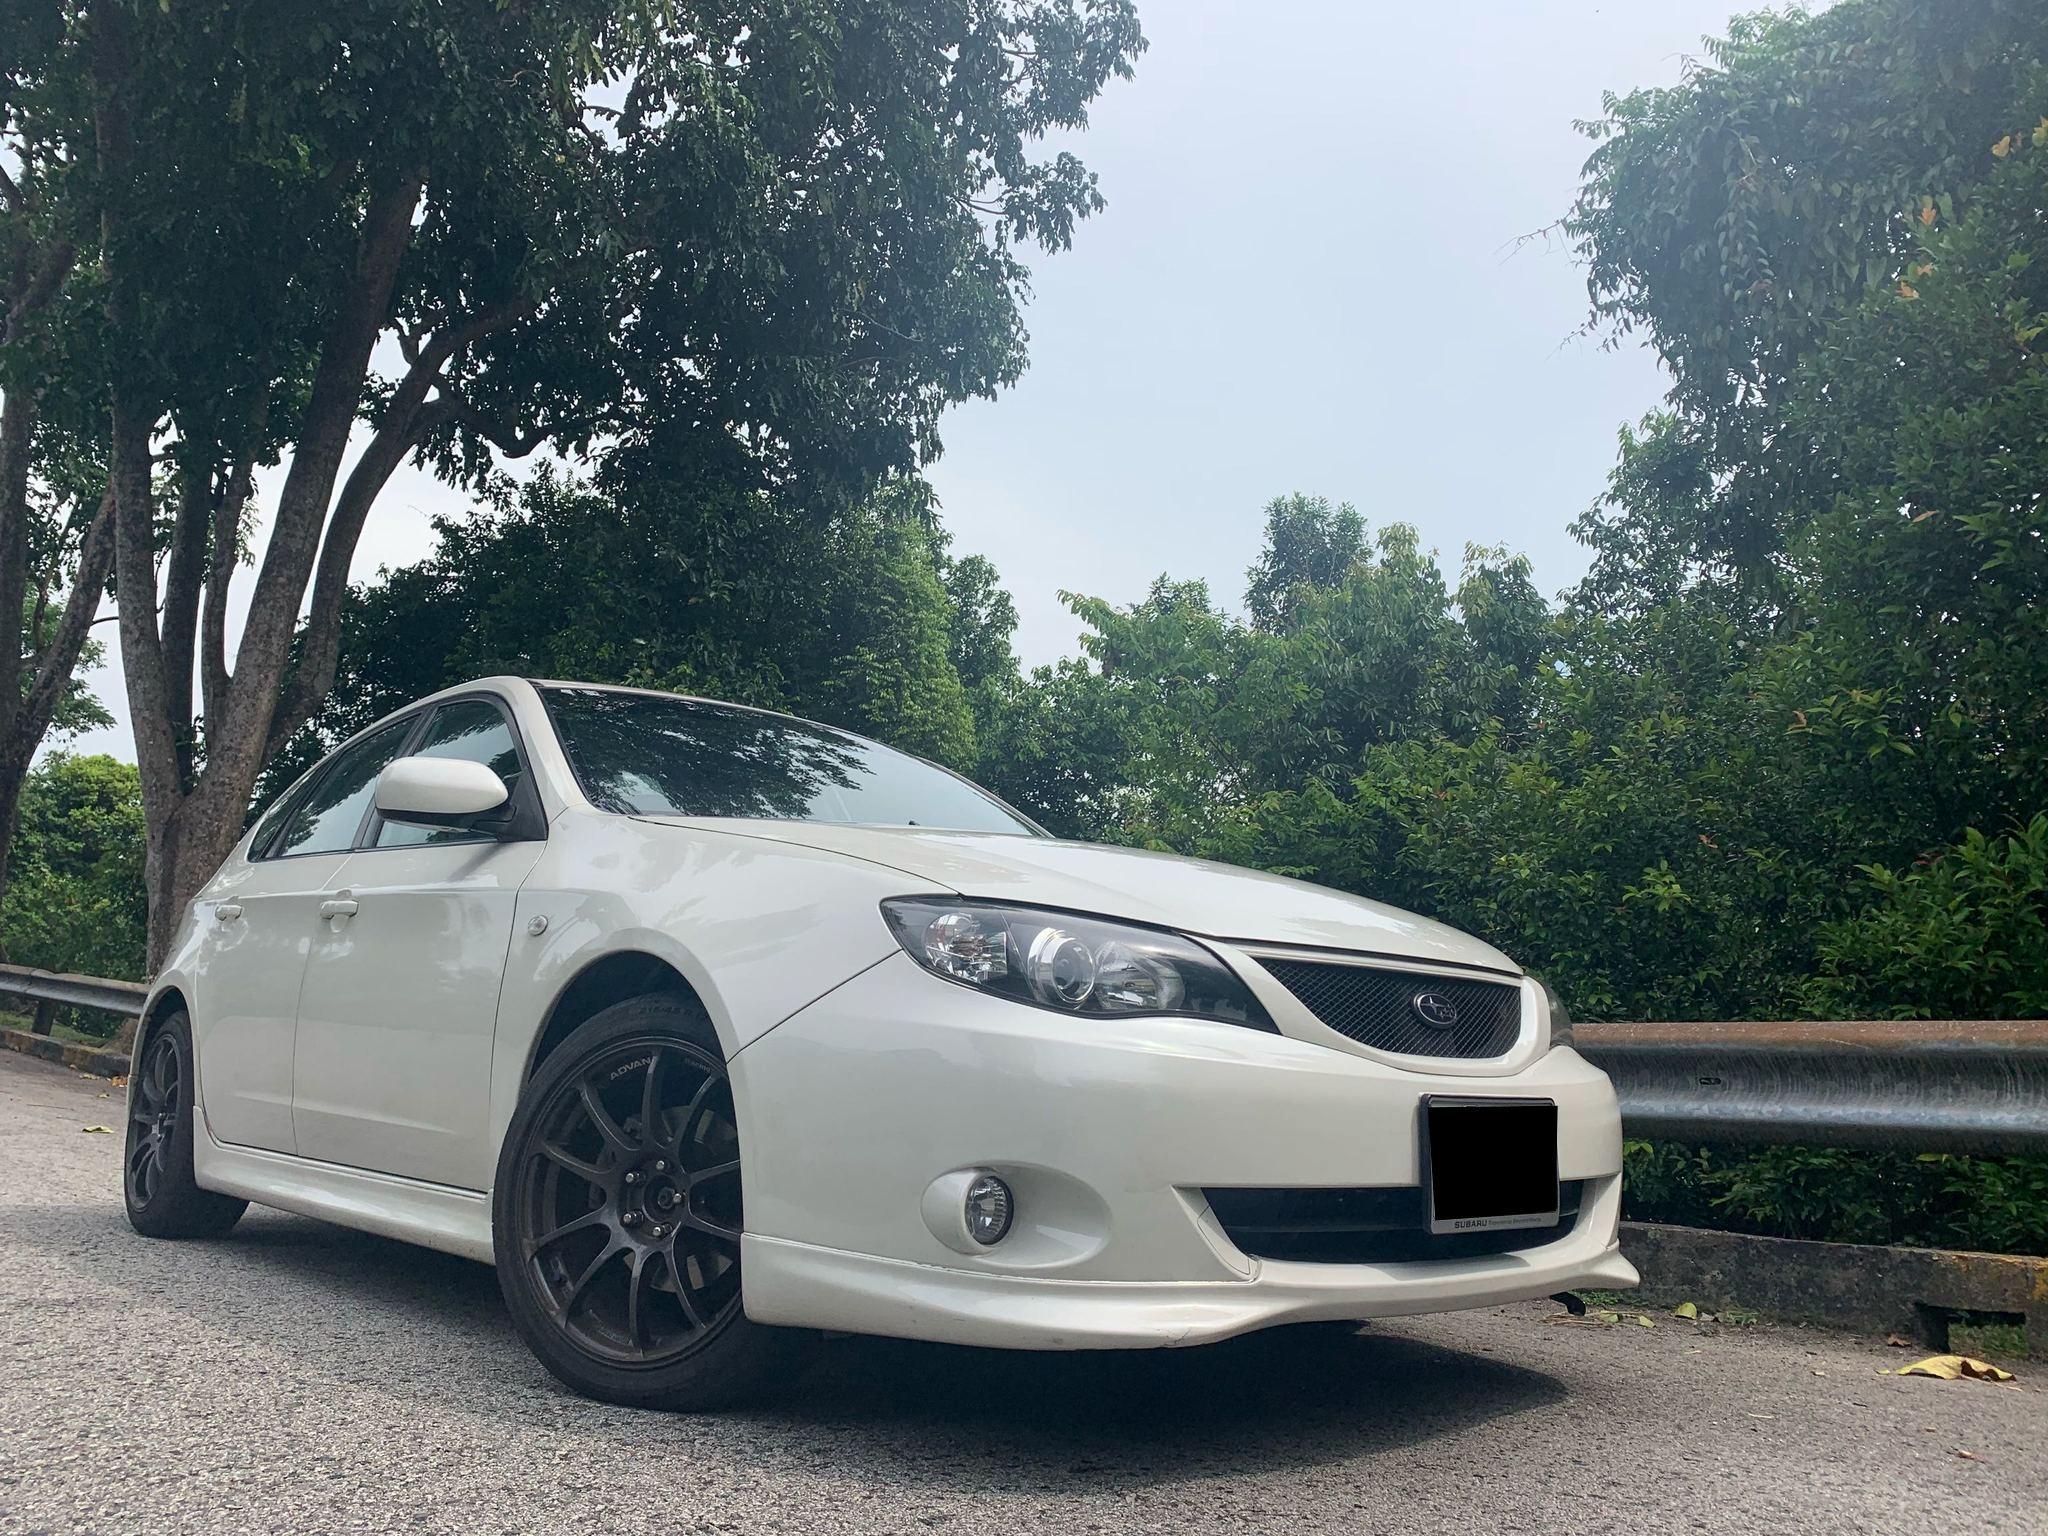 Subaru Impreza 1.5 R 5-Dr Auto